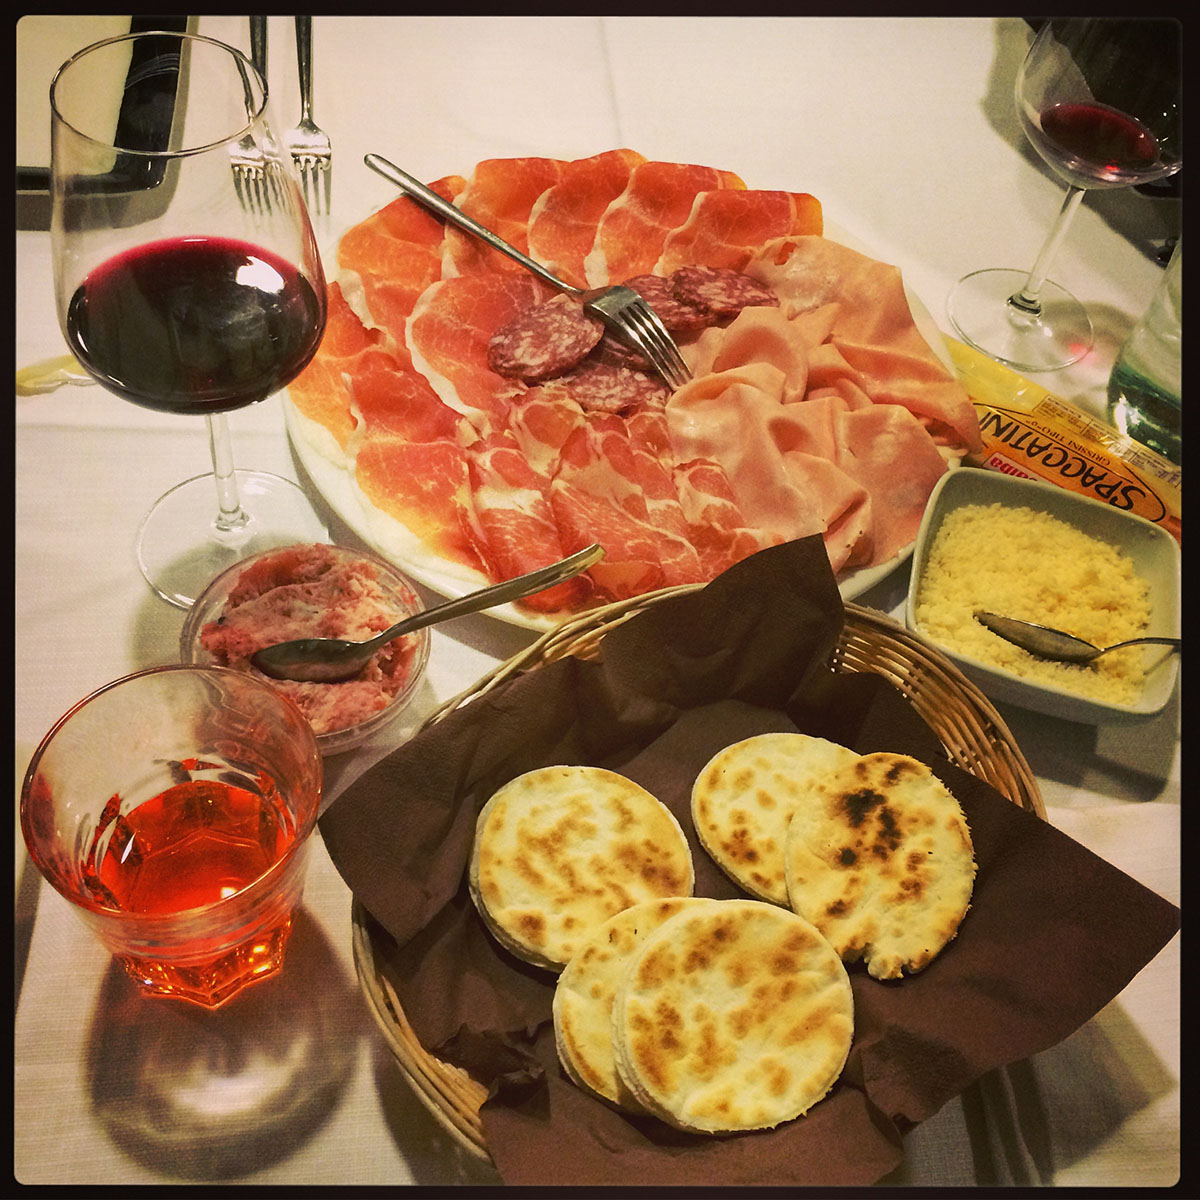 22IMG 5436 Эмилия Романья: вино, салями и автомобили